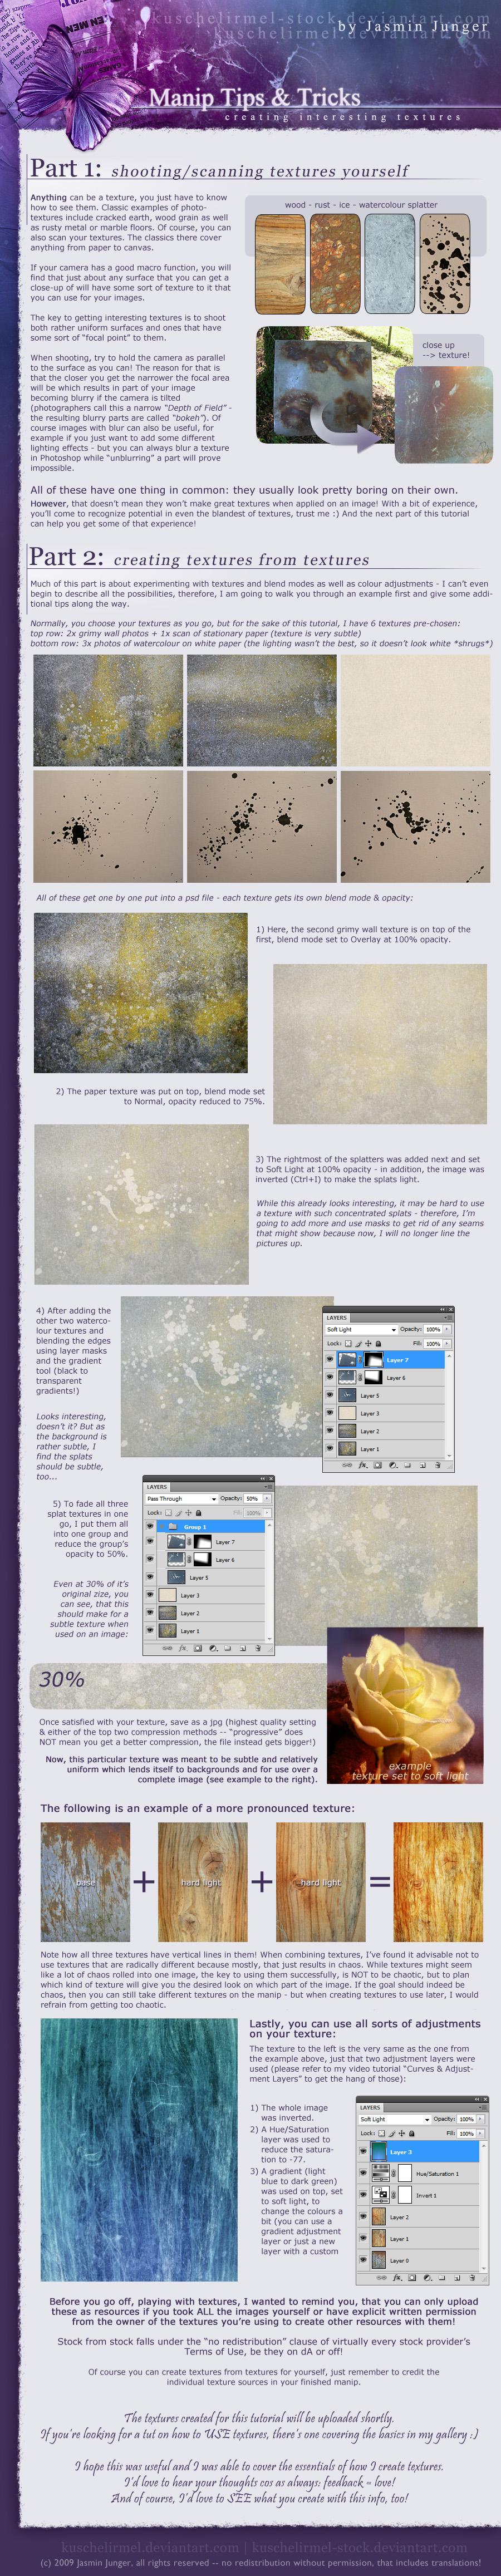 Manip T+T: Creating Textures